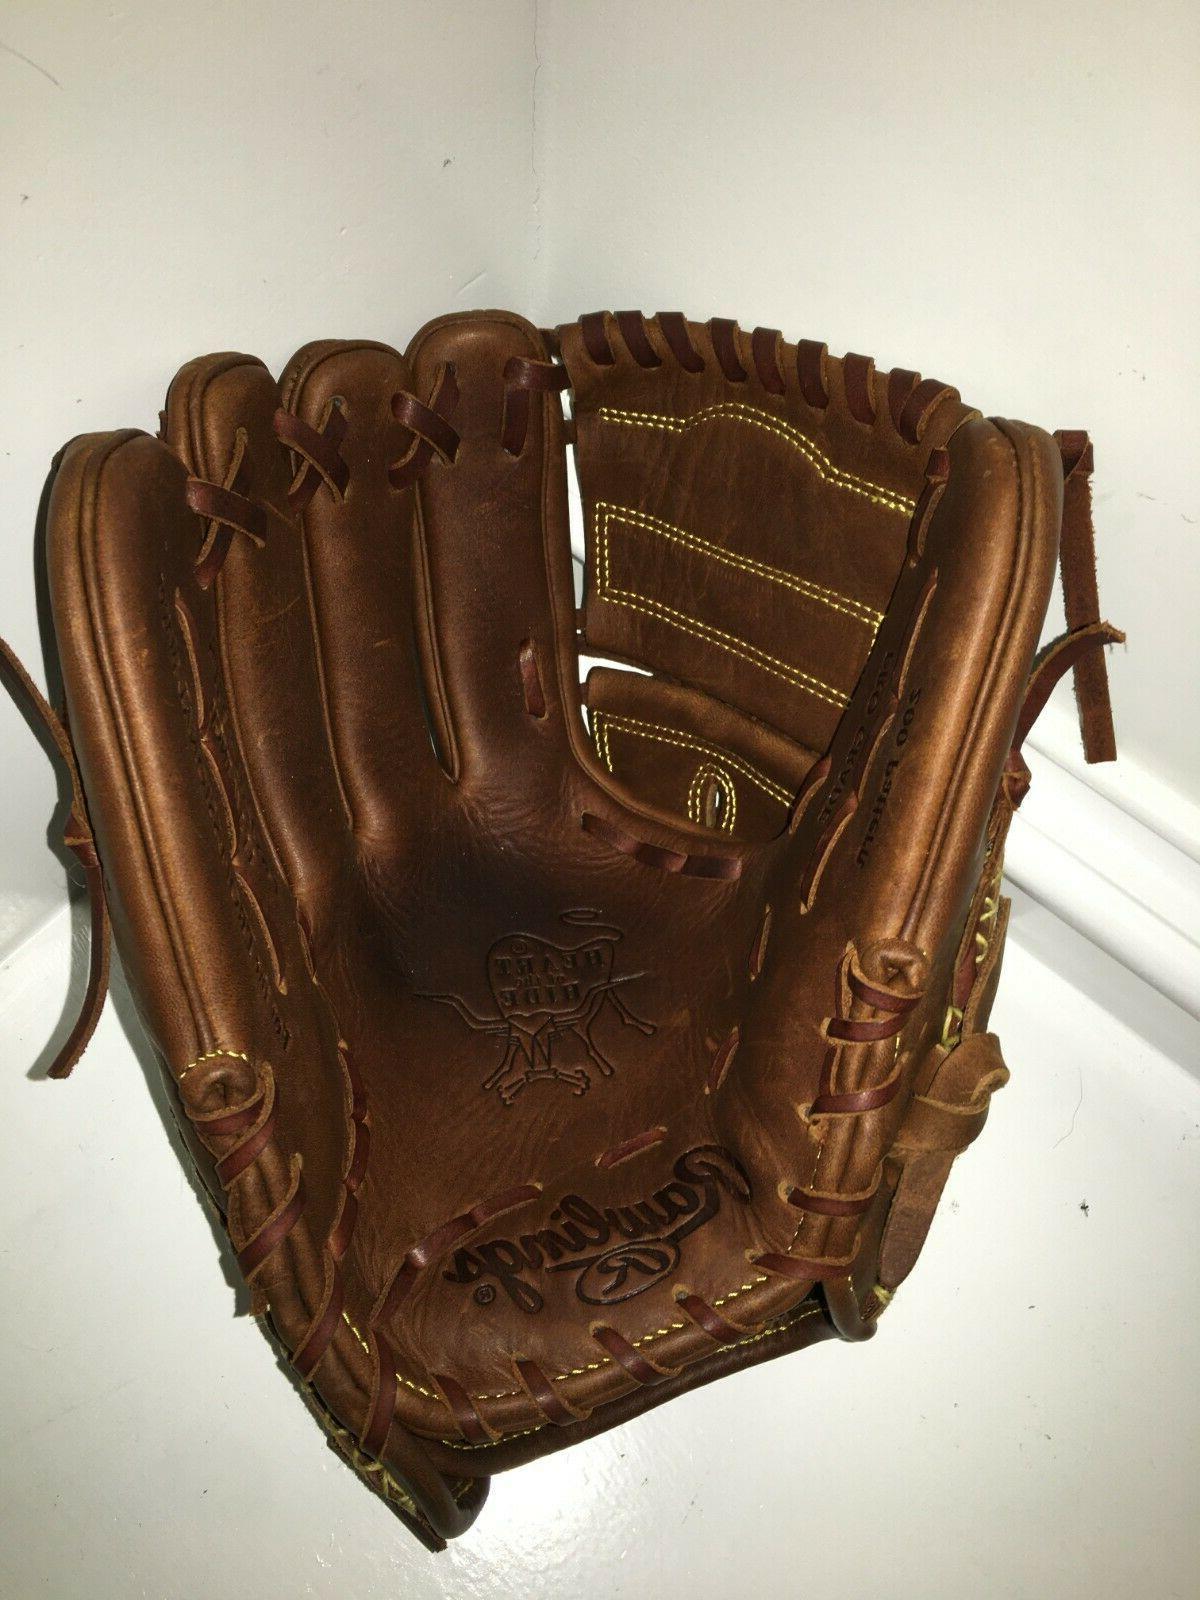 NEW Rawlings RHT Heart of Baseball SHIFT